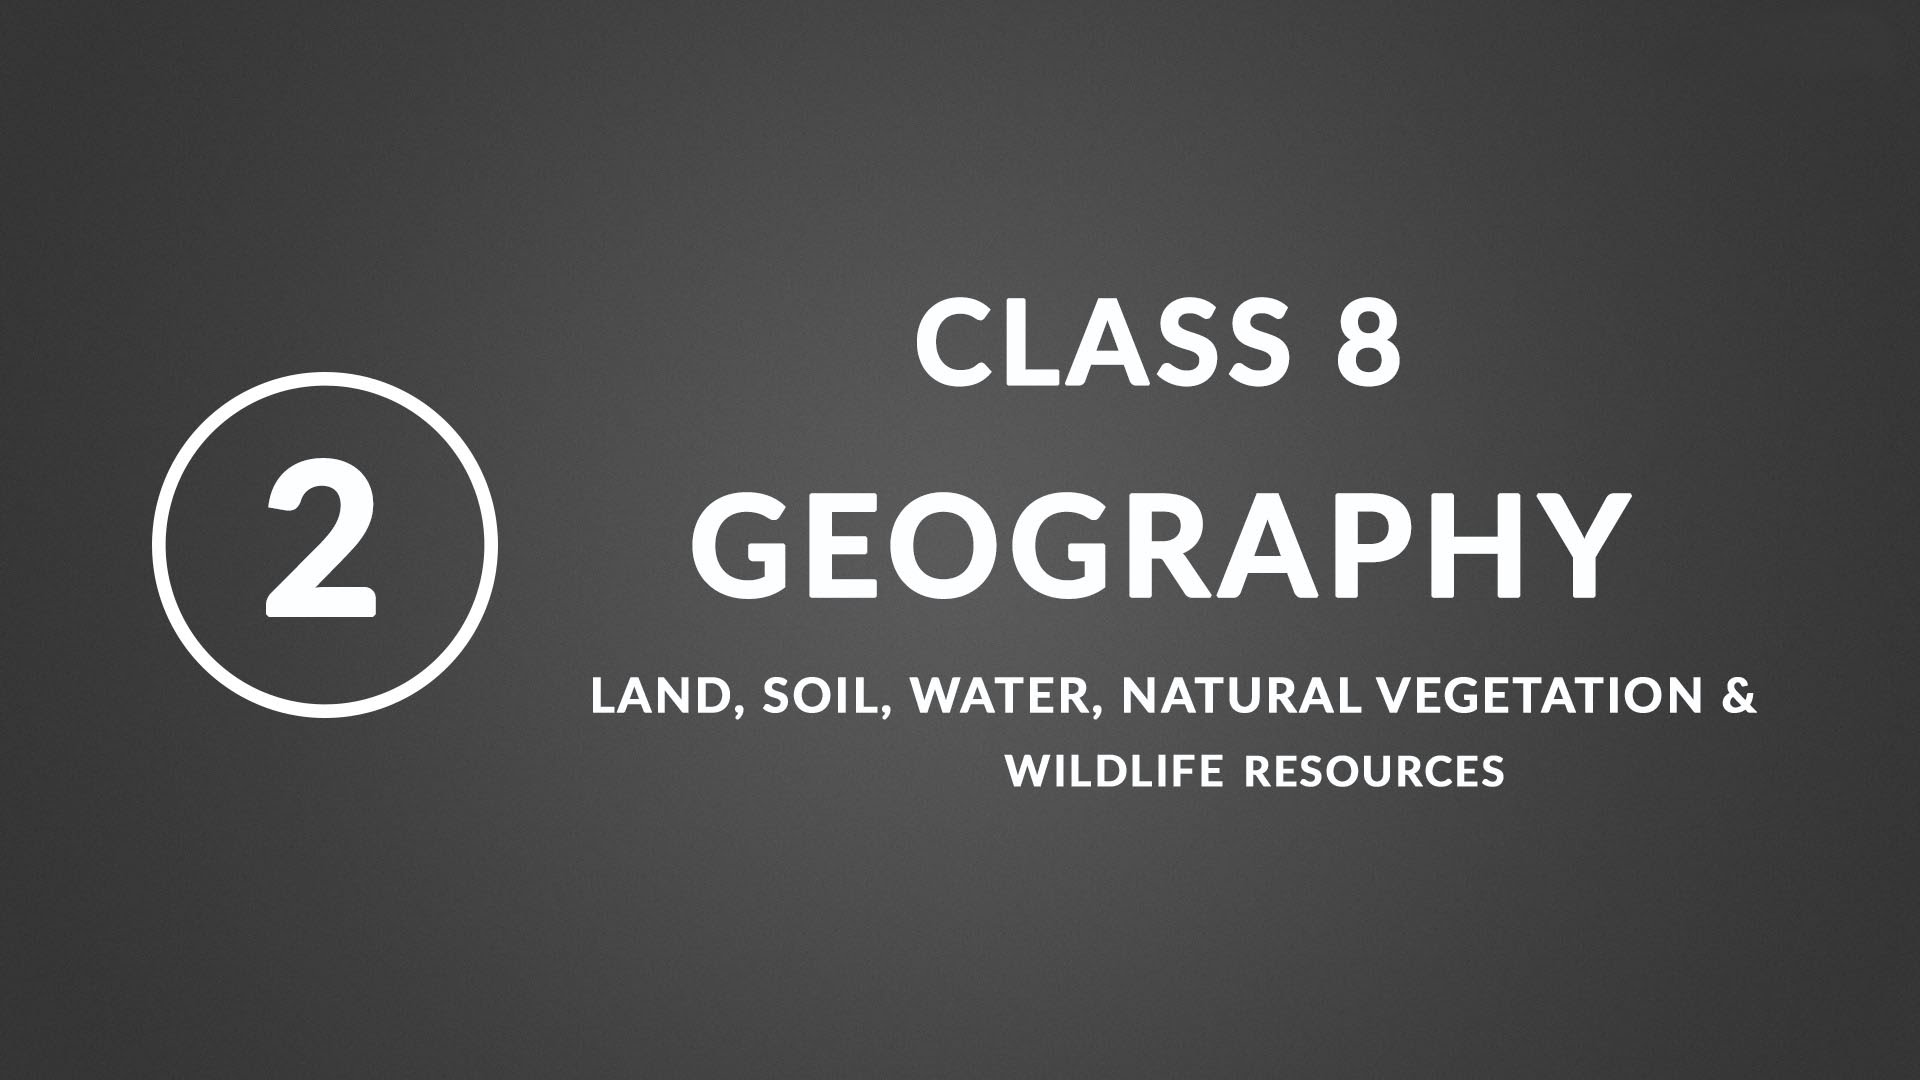 land soil water natural vegetation wildlife ncert class 8